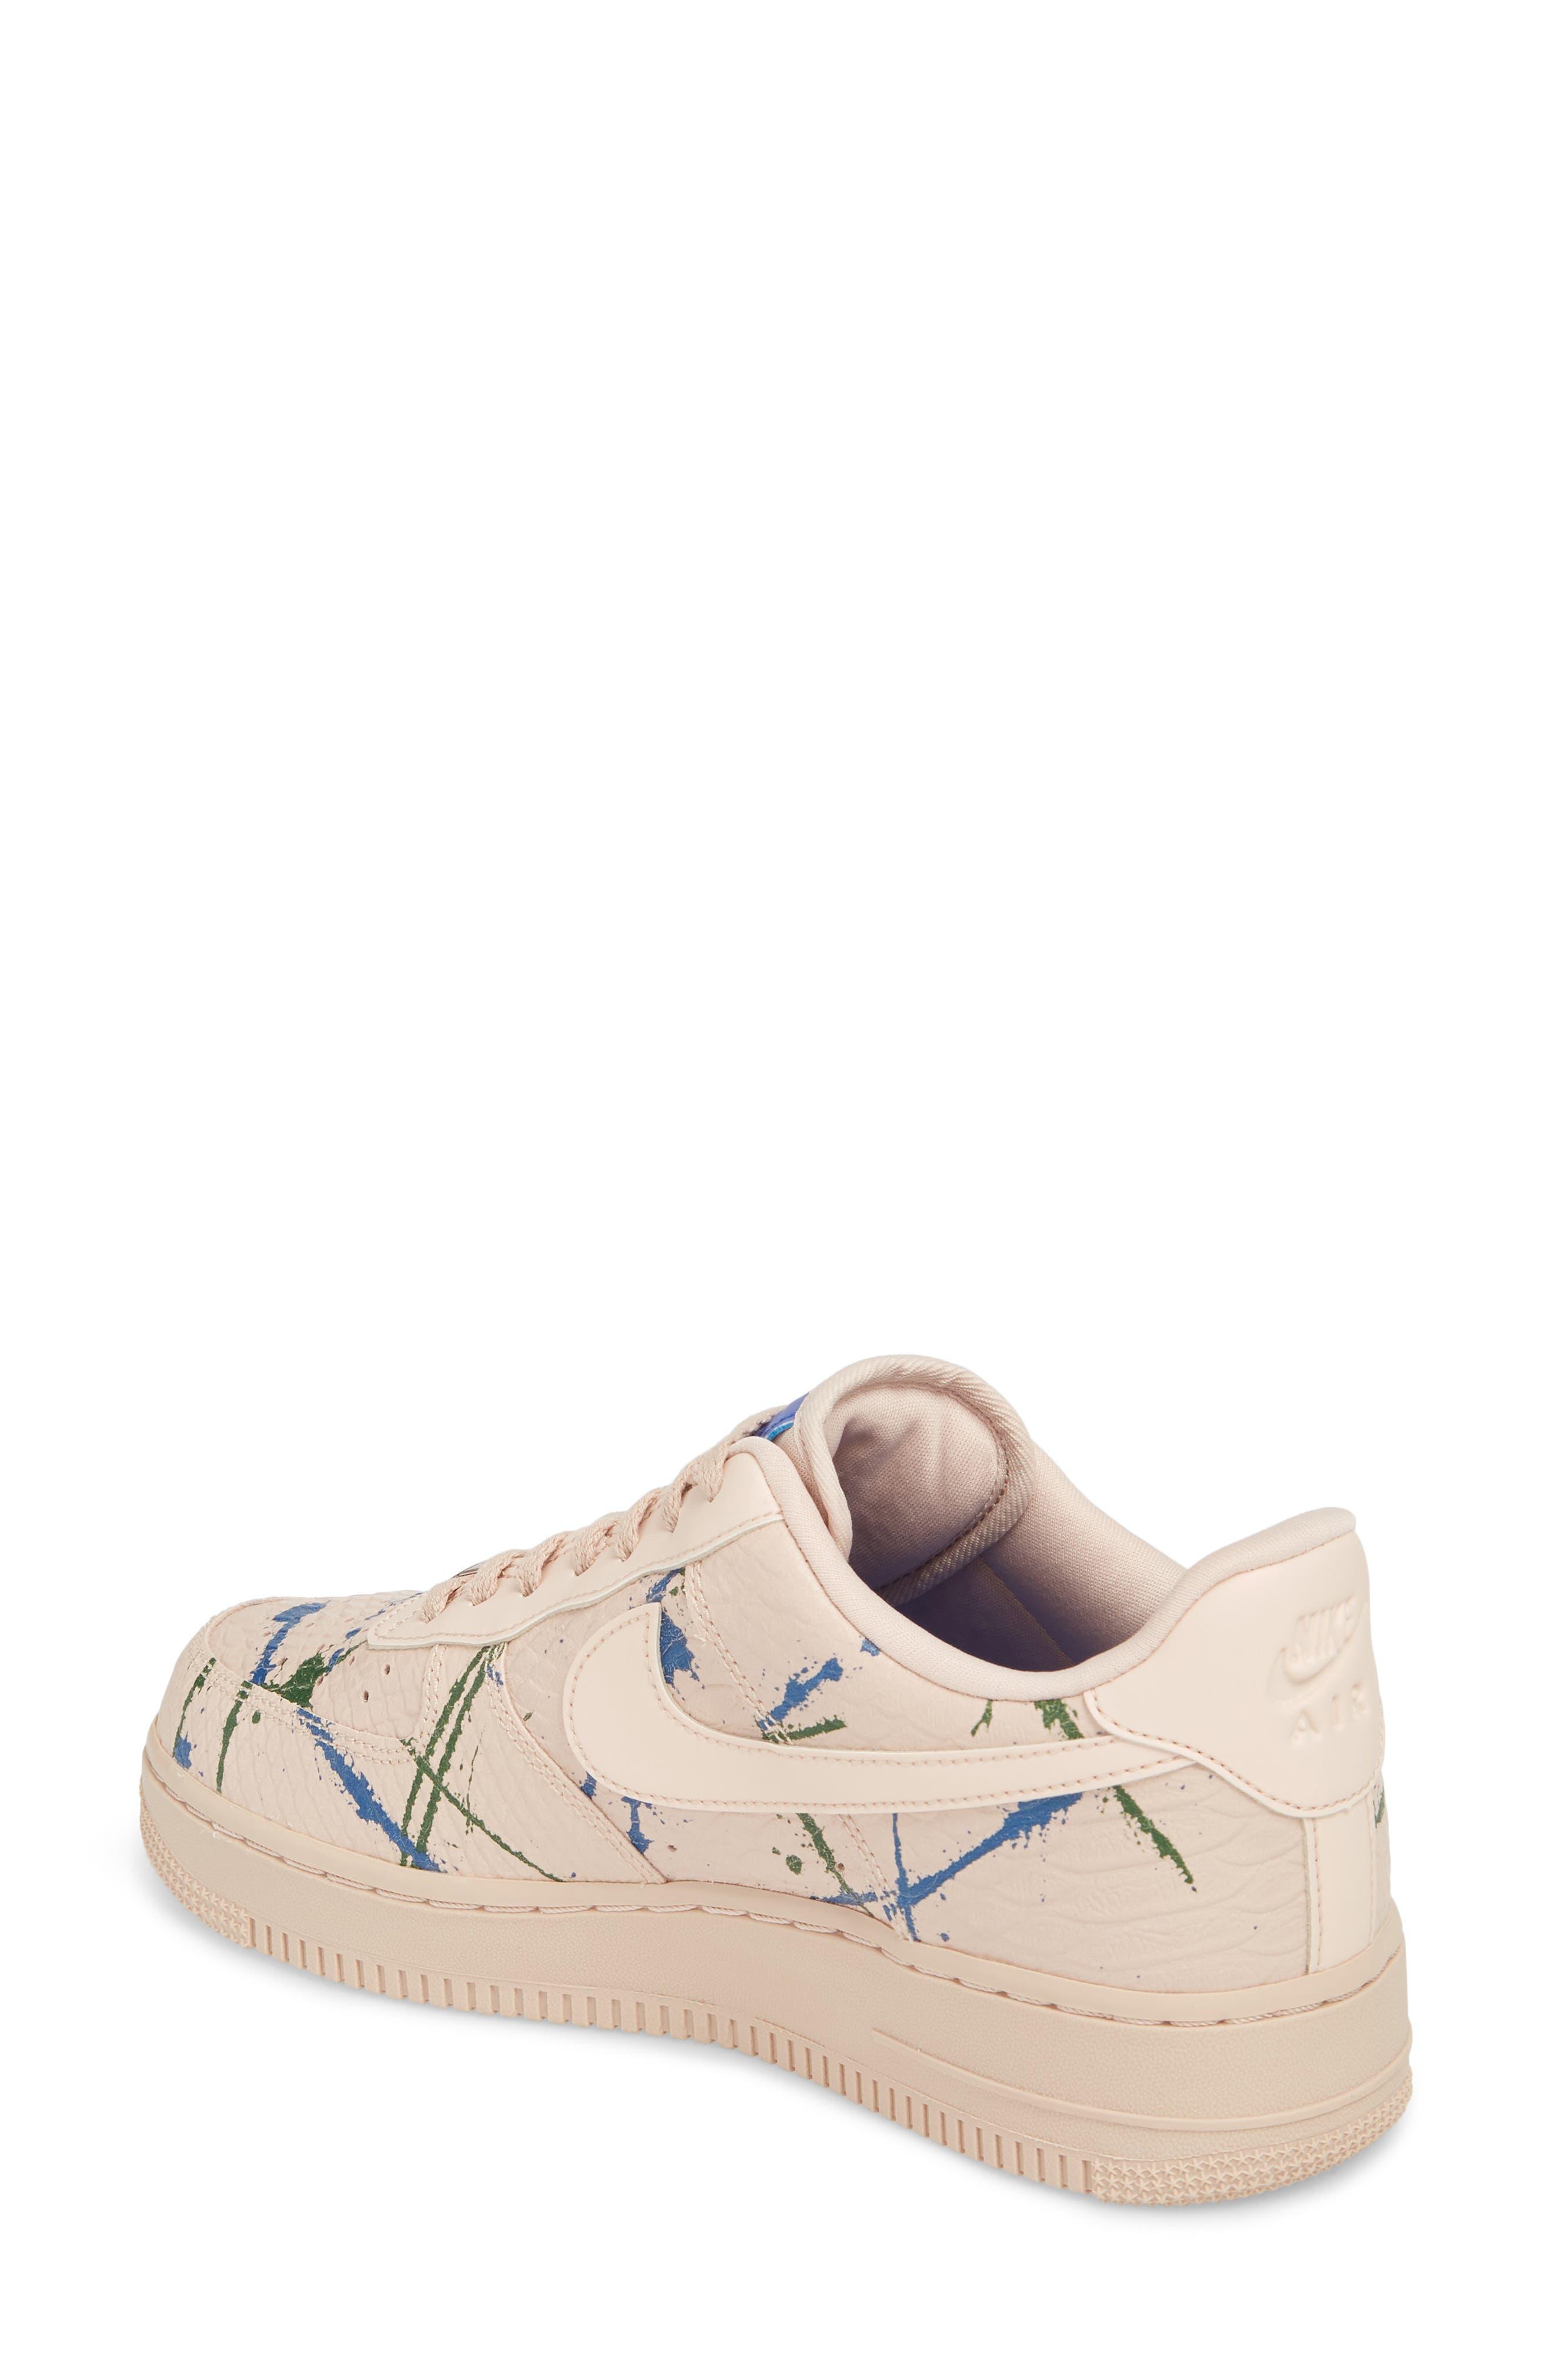 Air Force 1 '07 LX Sneaker,                             Alternate thumbnail 2, color,                             Particle Beige